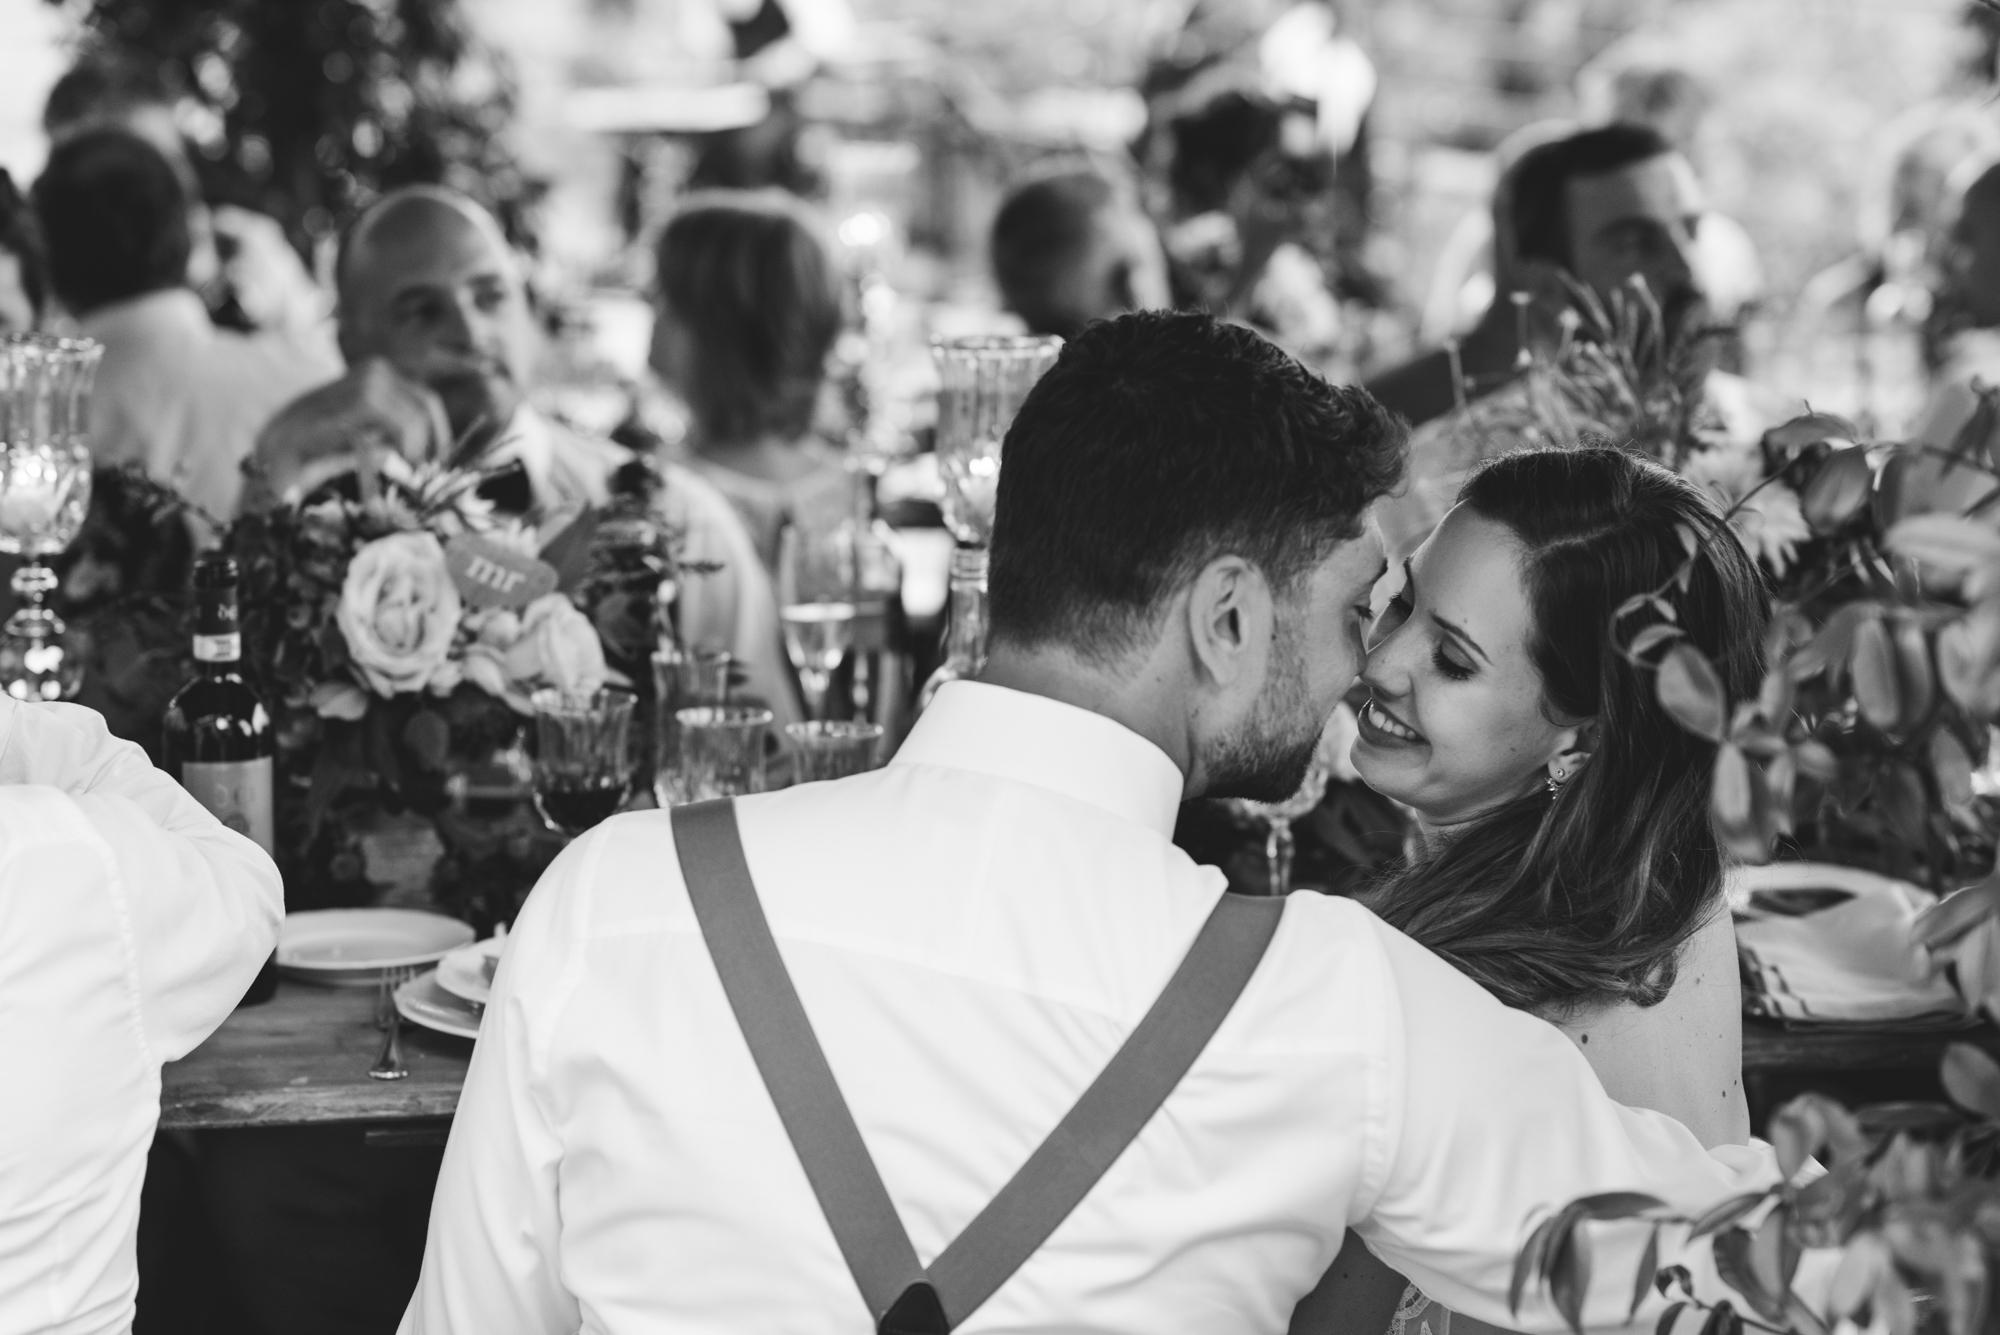 Wedding_Photographer_in_Tuscany_Italy-039.jpg